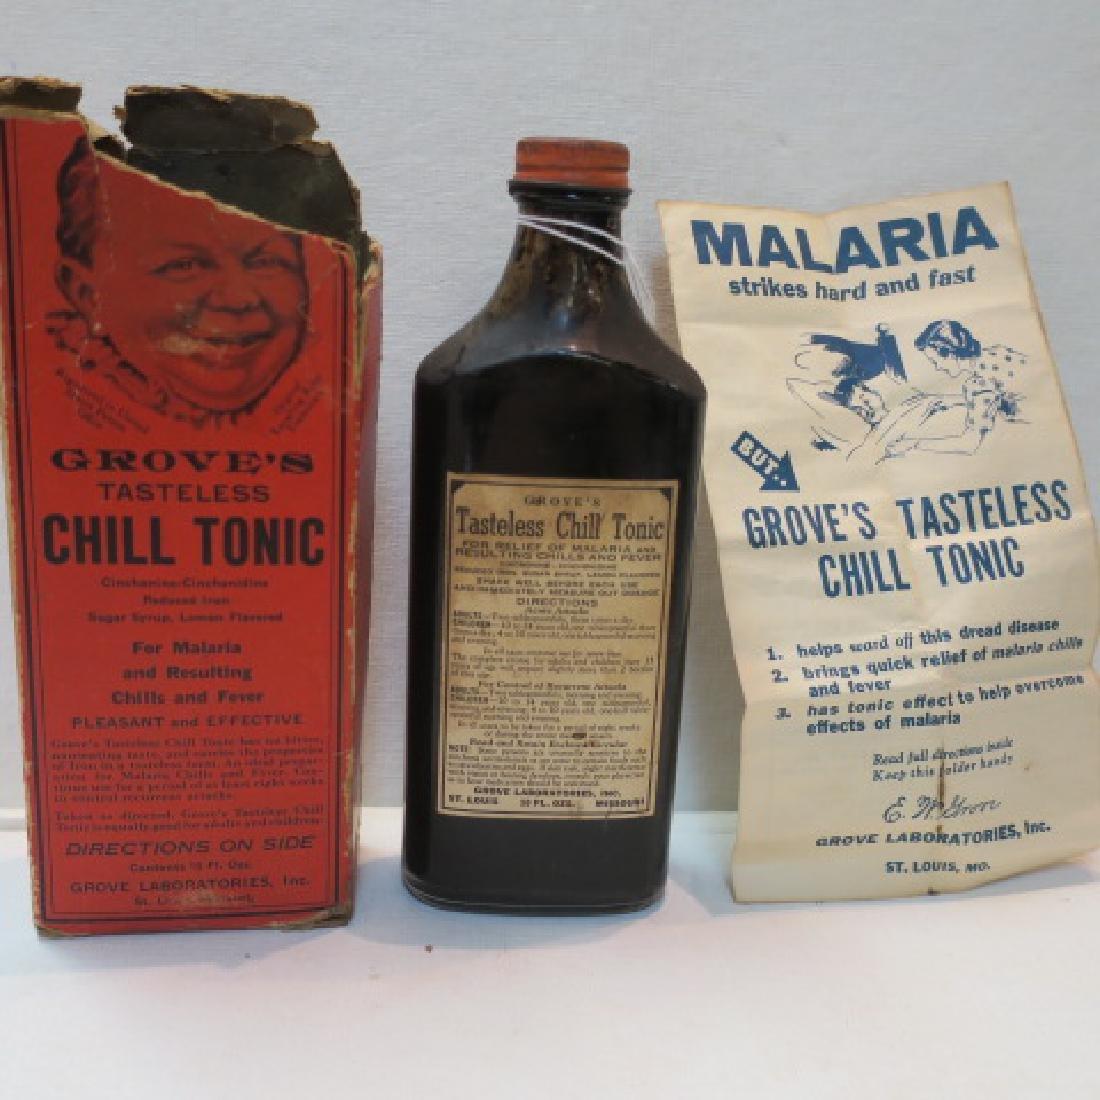 GROVE'S TASTLESS CHILL TONIC in Original Box: